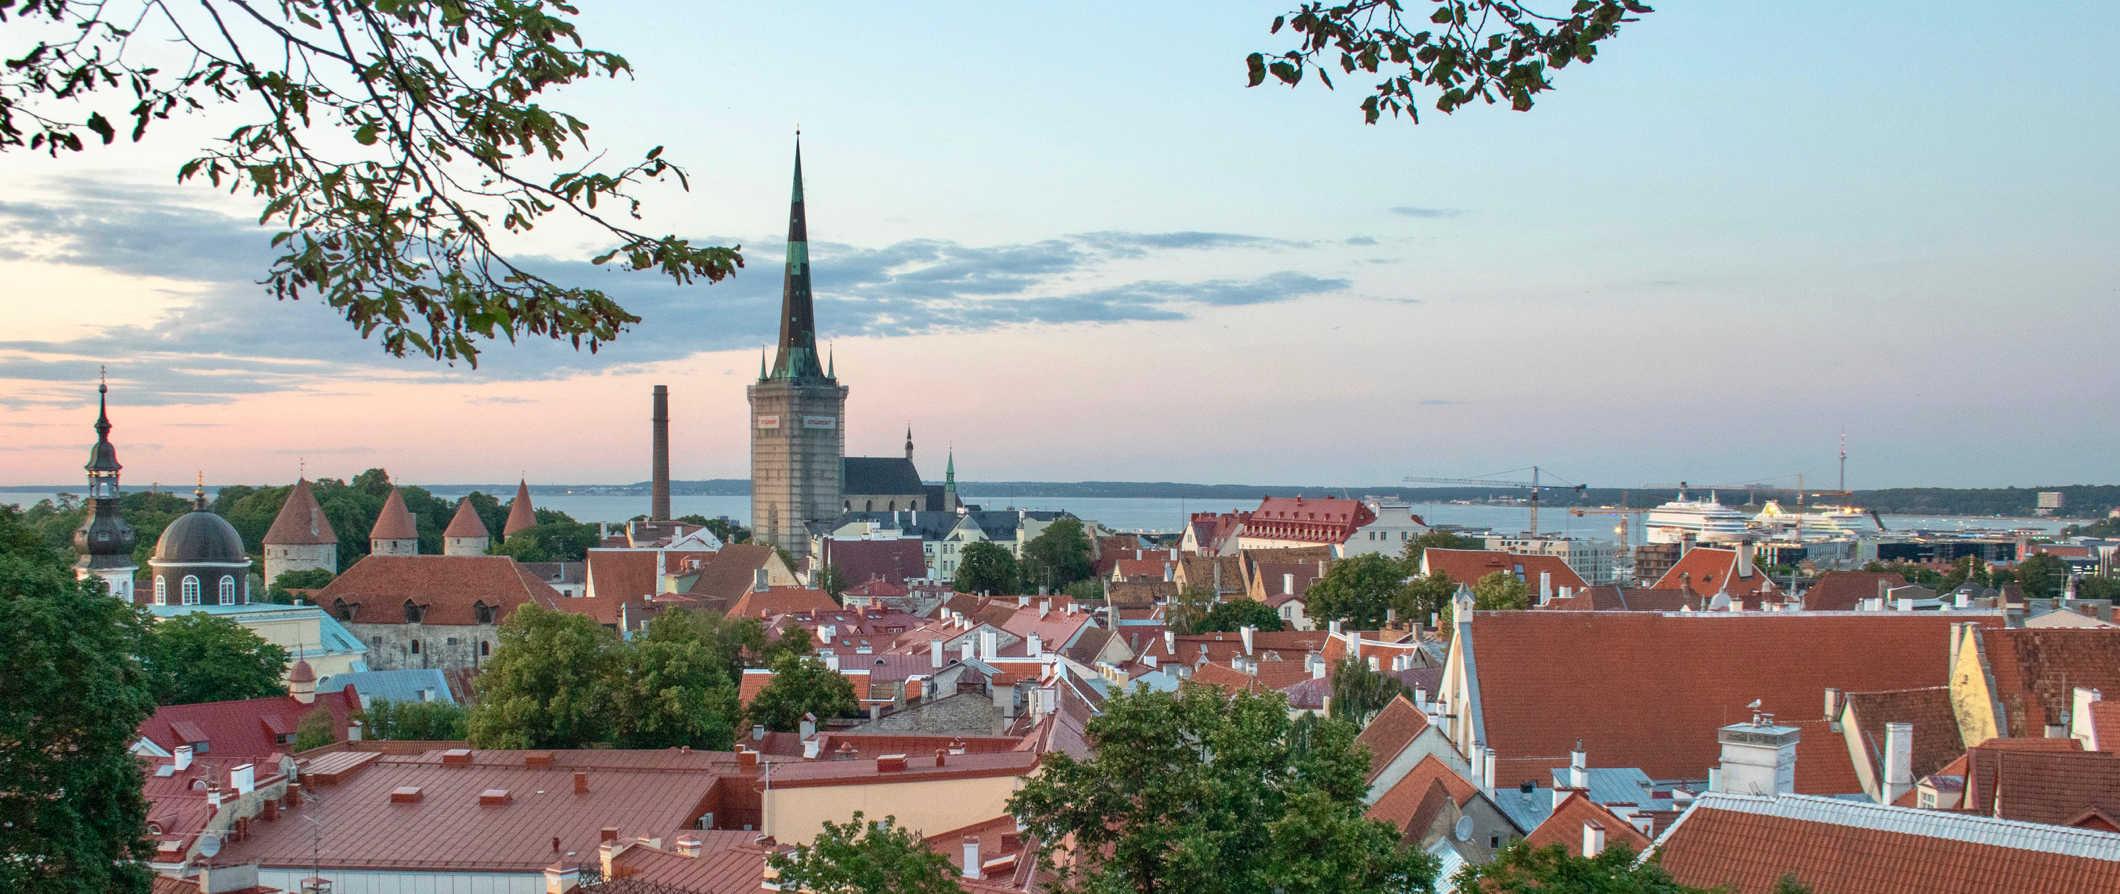 The historic Viru Gate in Tallinn, Estonia